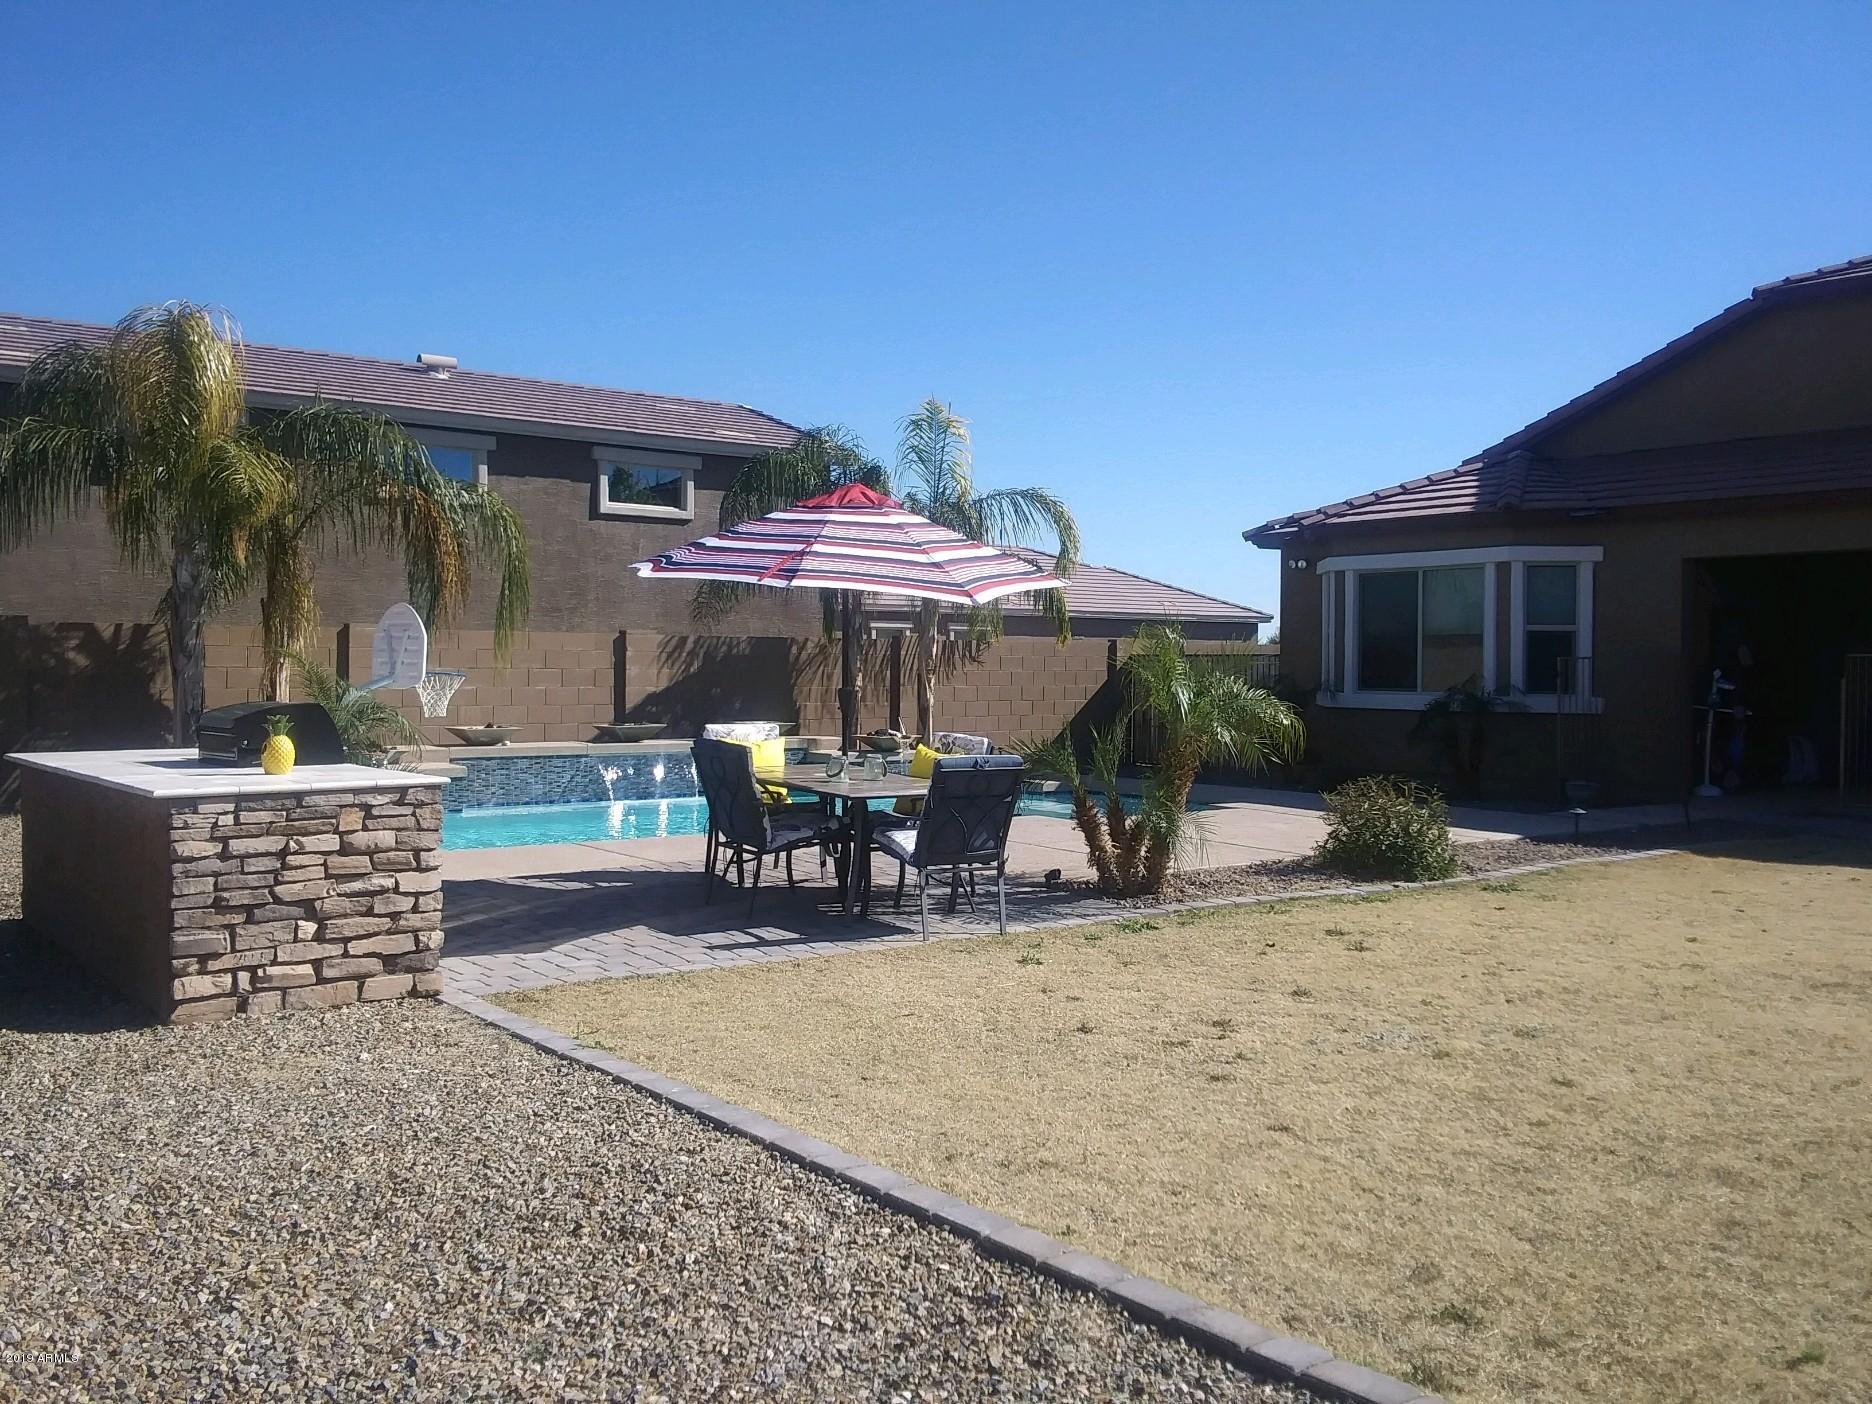 MLS 5871826 18328 W Marshall Avenue, Litchfield Park, AZ 85340 Litchfield Park AZ Three Bedroom